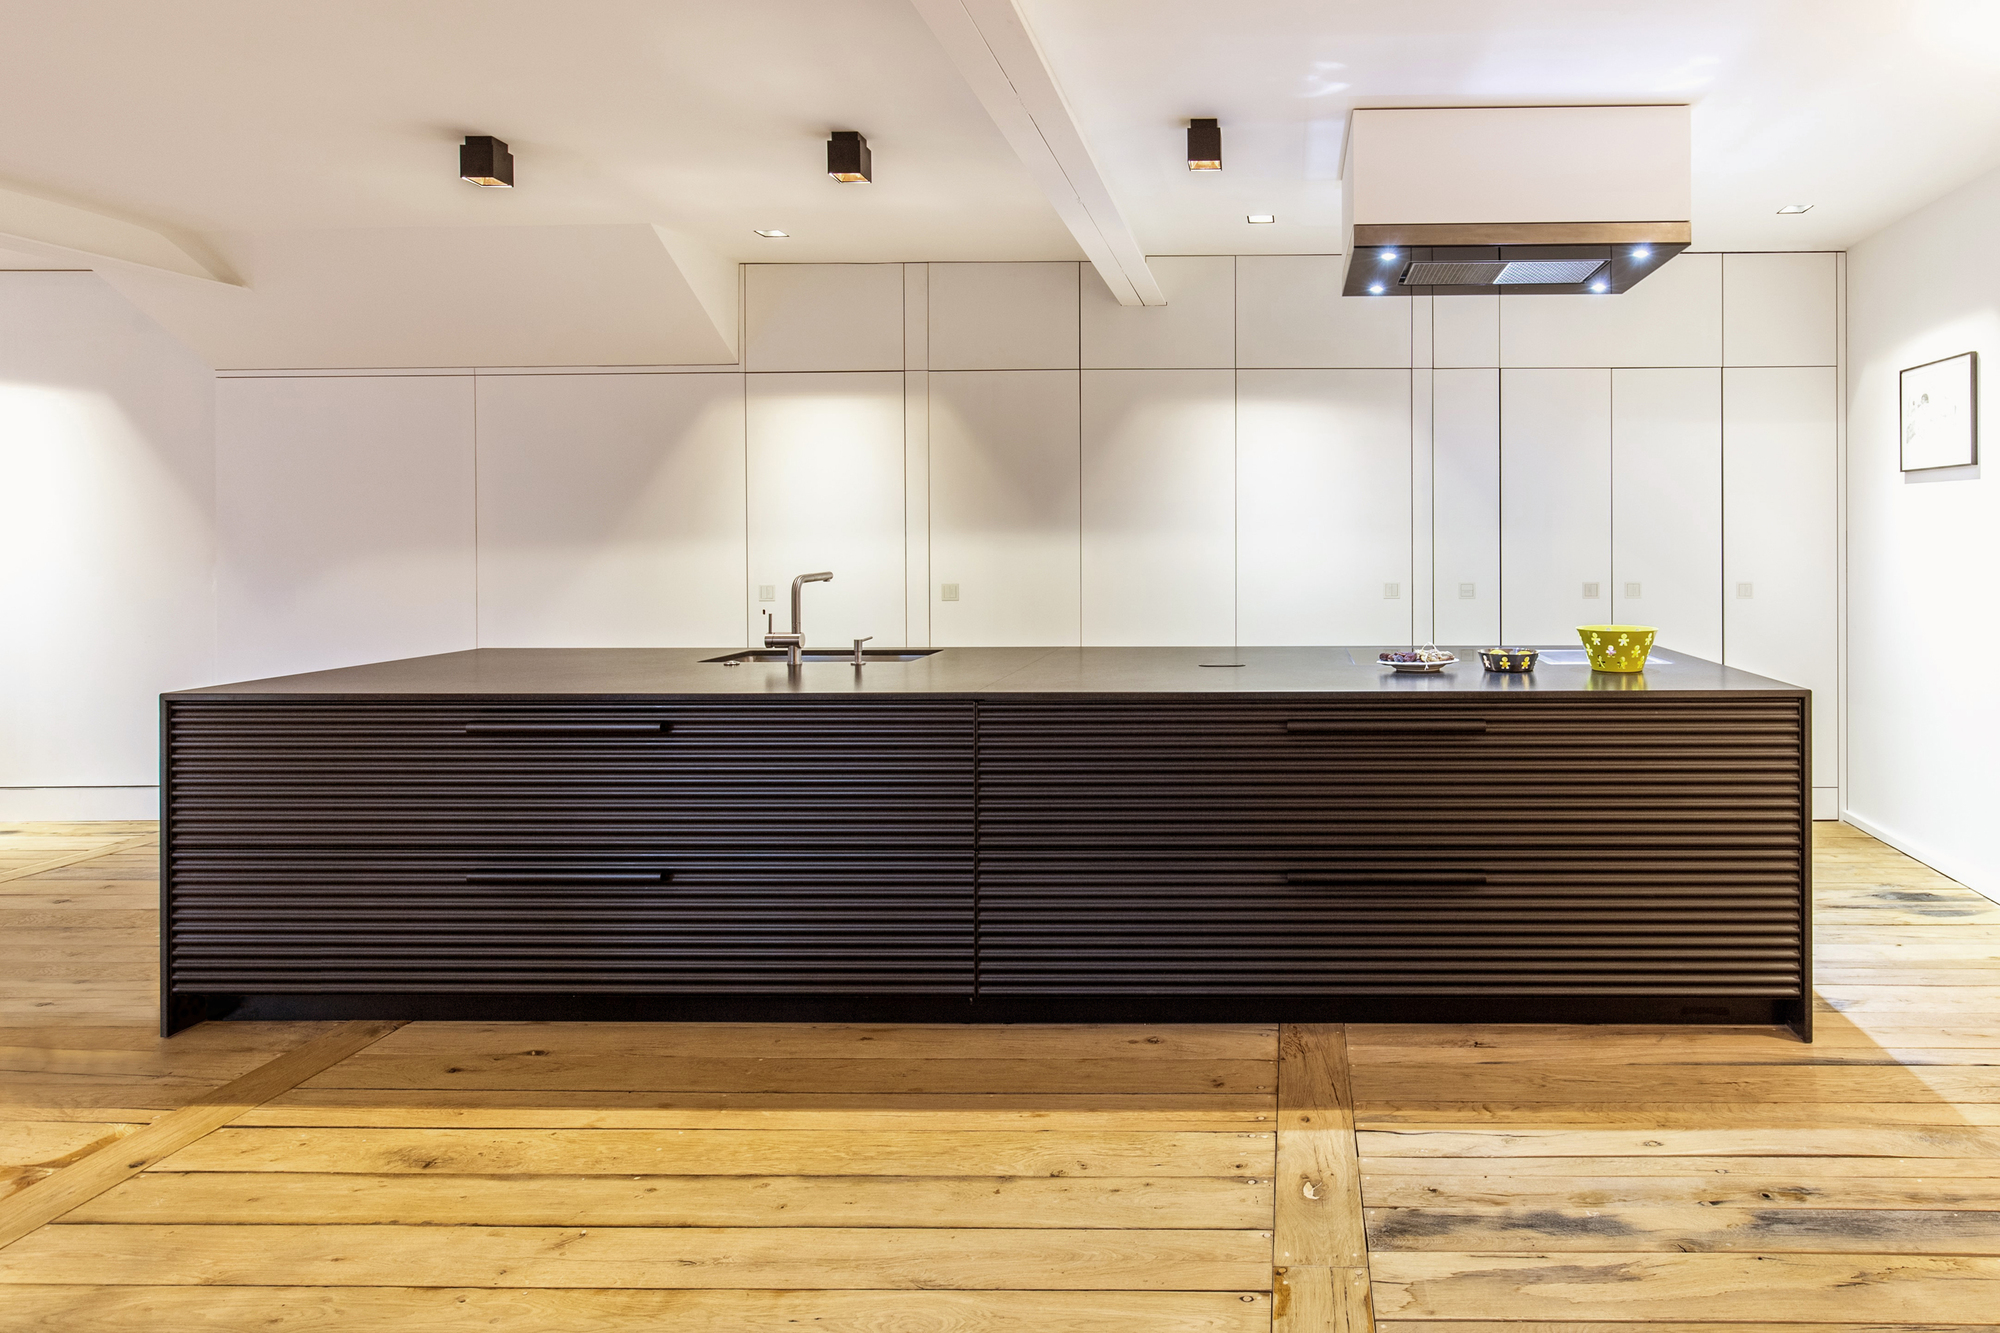 galer a de casa msr brengues le pavec architectes 10. Black Bedroom Furniture Sets. Home Design Ideas